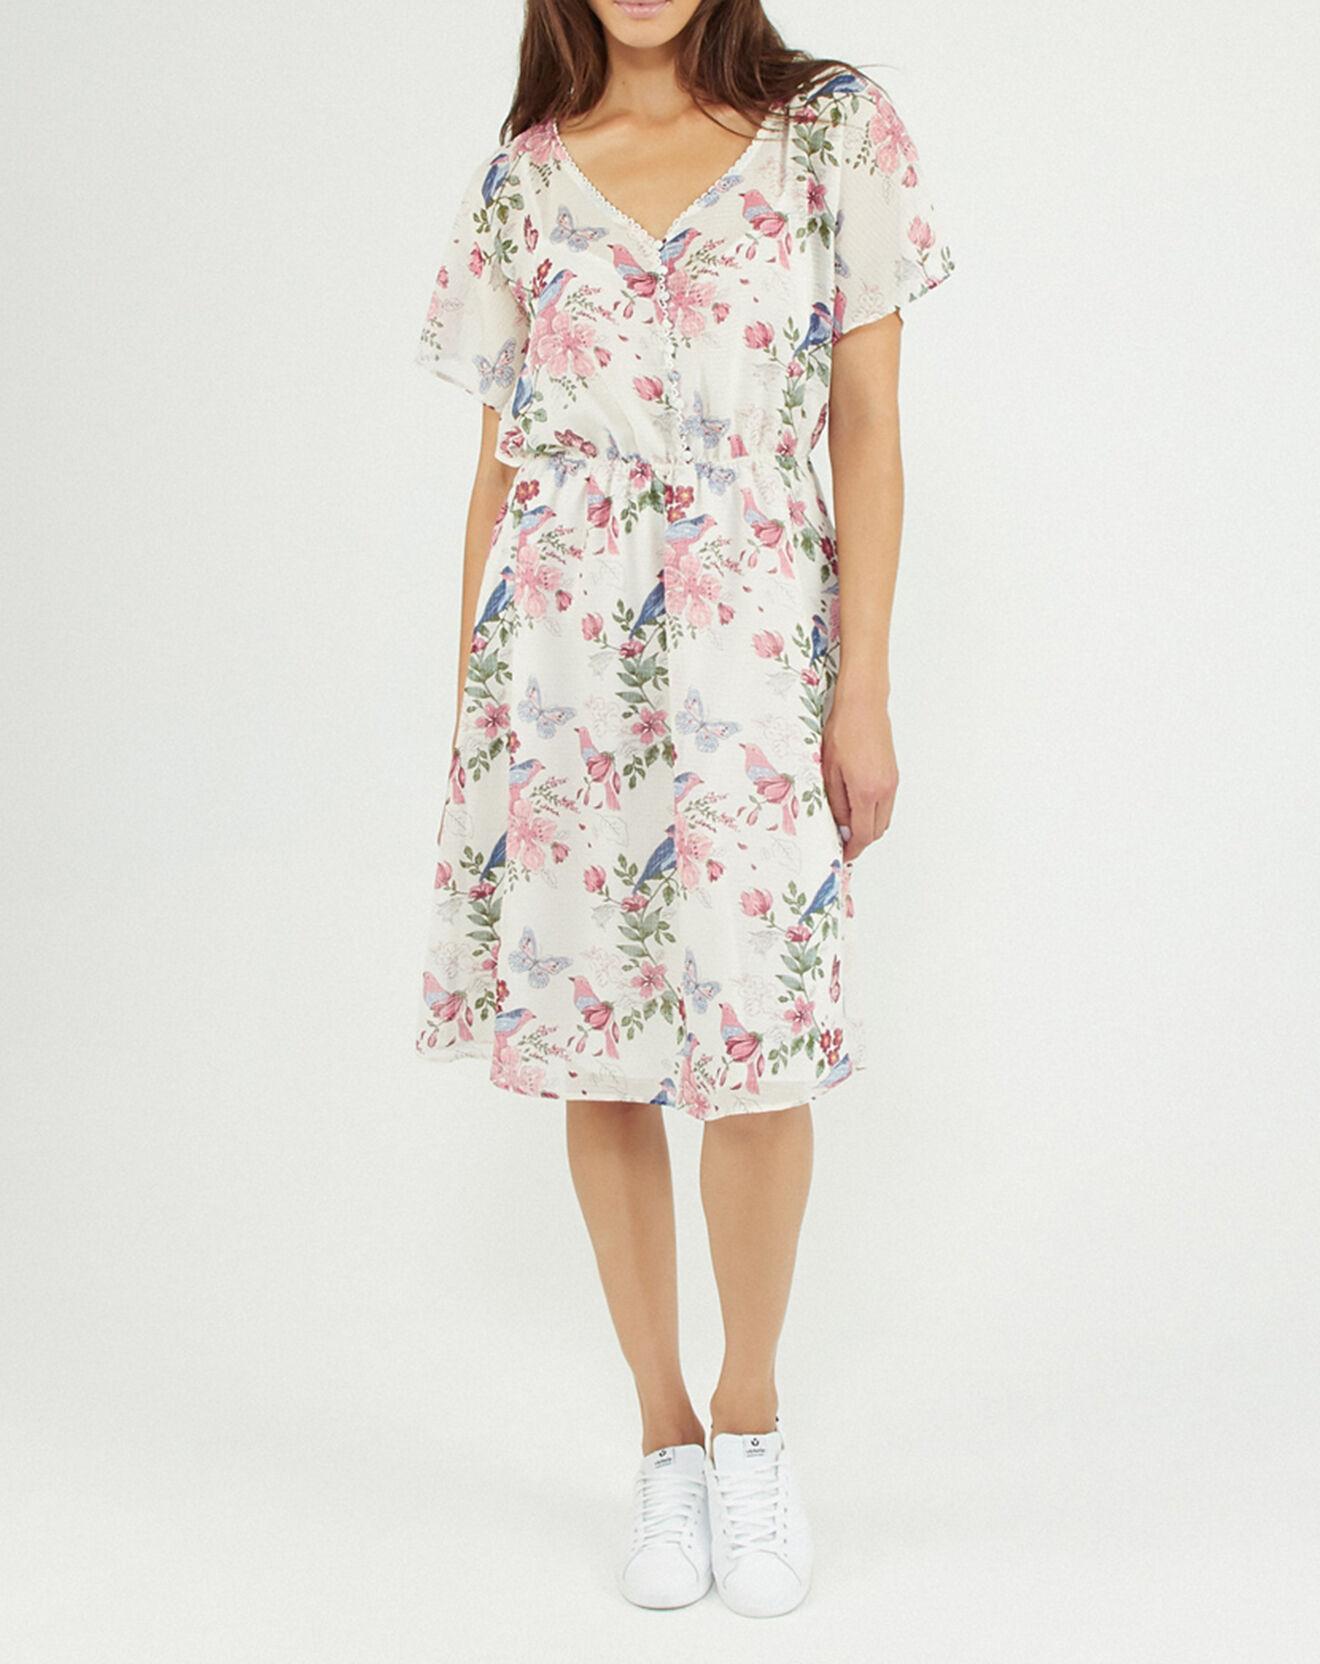 Robe imprimée printanier blanc/multicolore - Pepe Jeans - Modalova